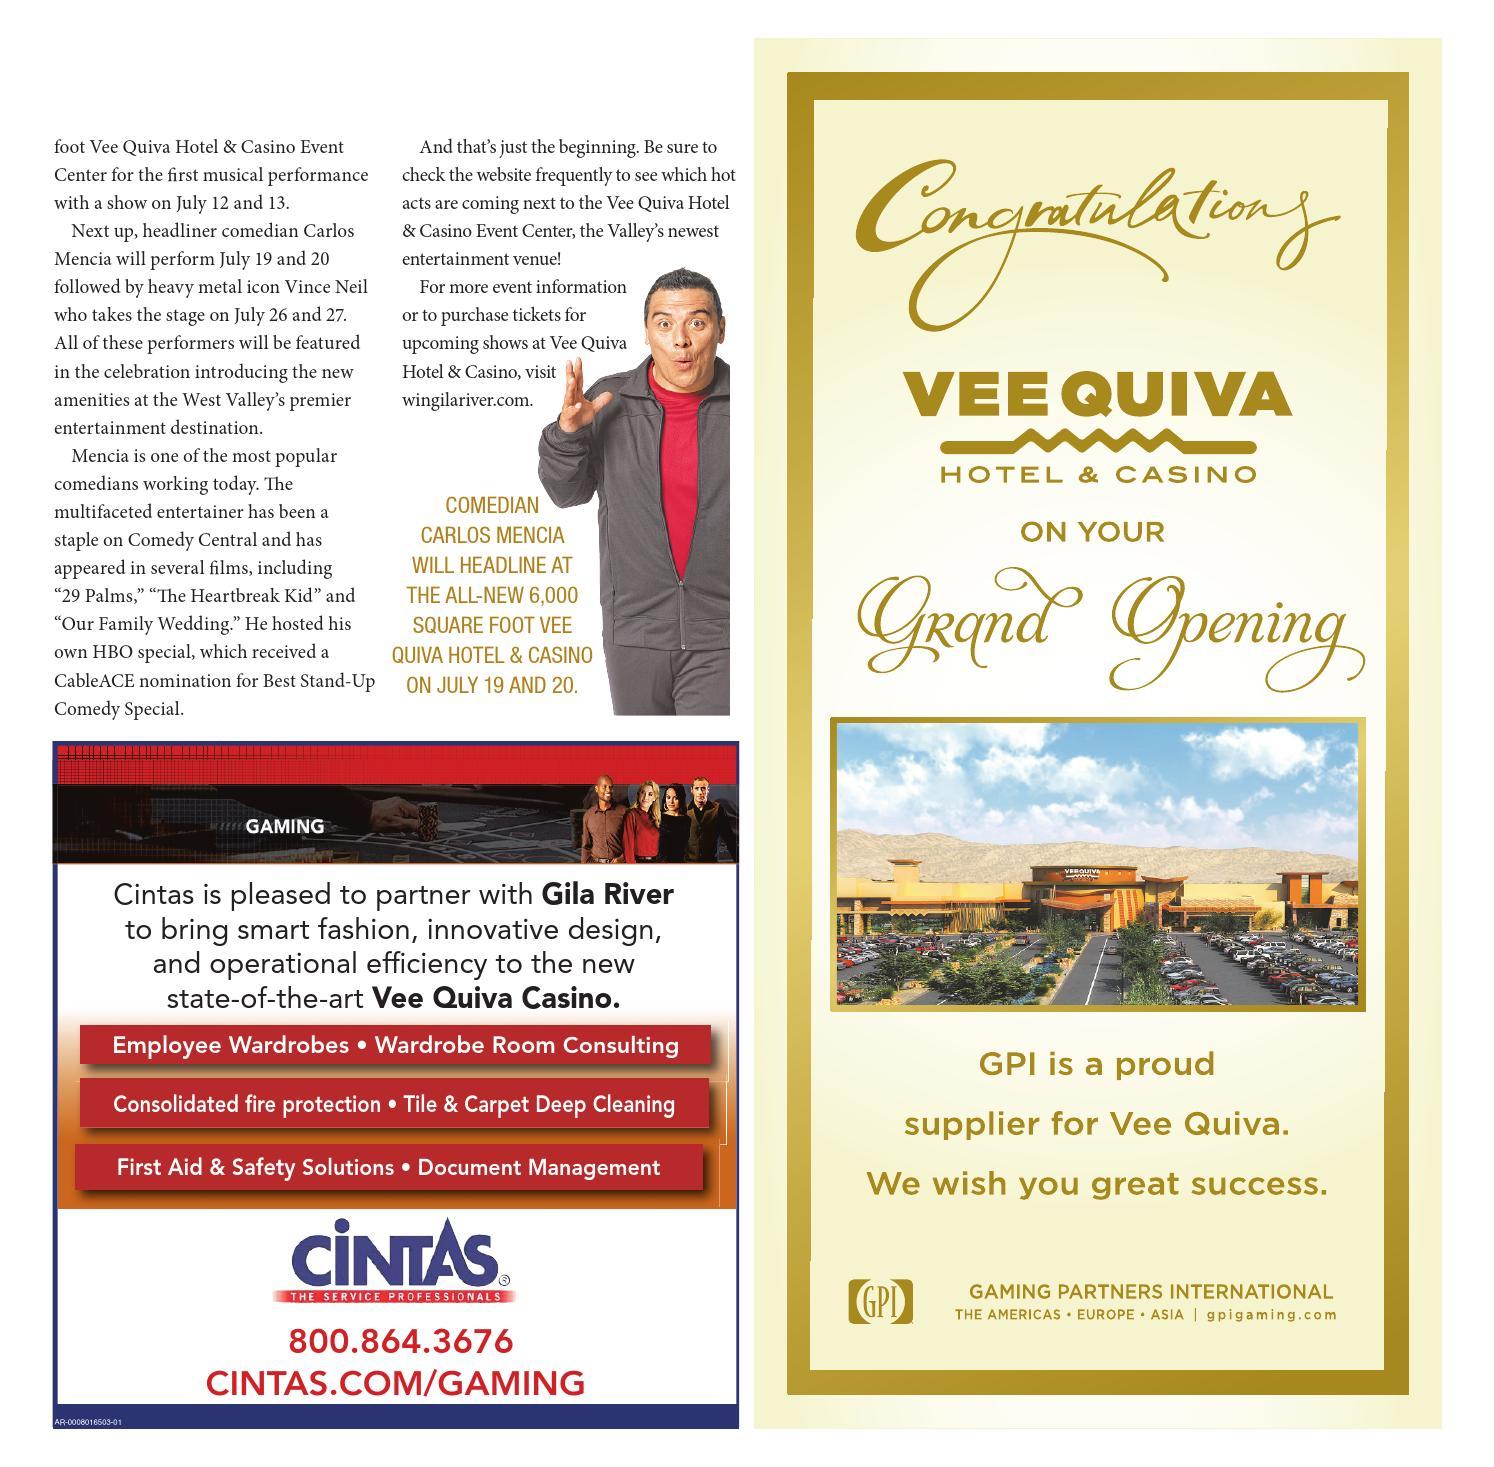 Vee Quiva Casino Grand Opening by Republic Media Content